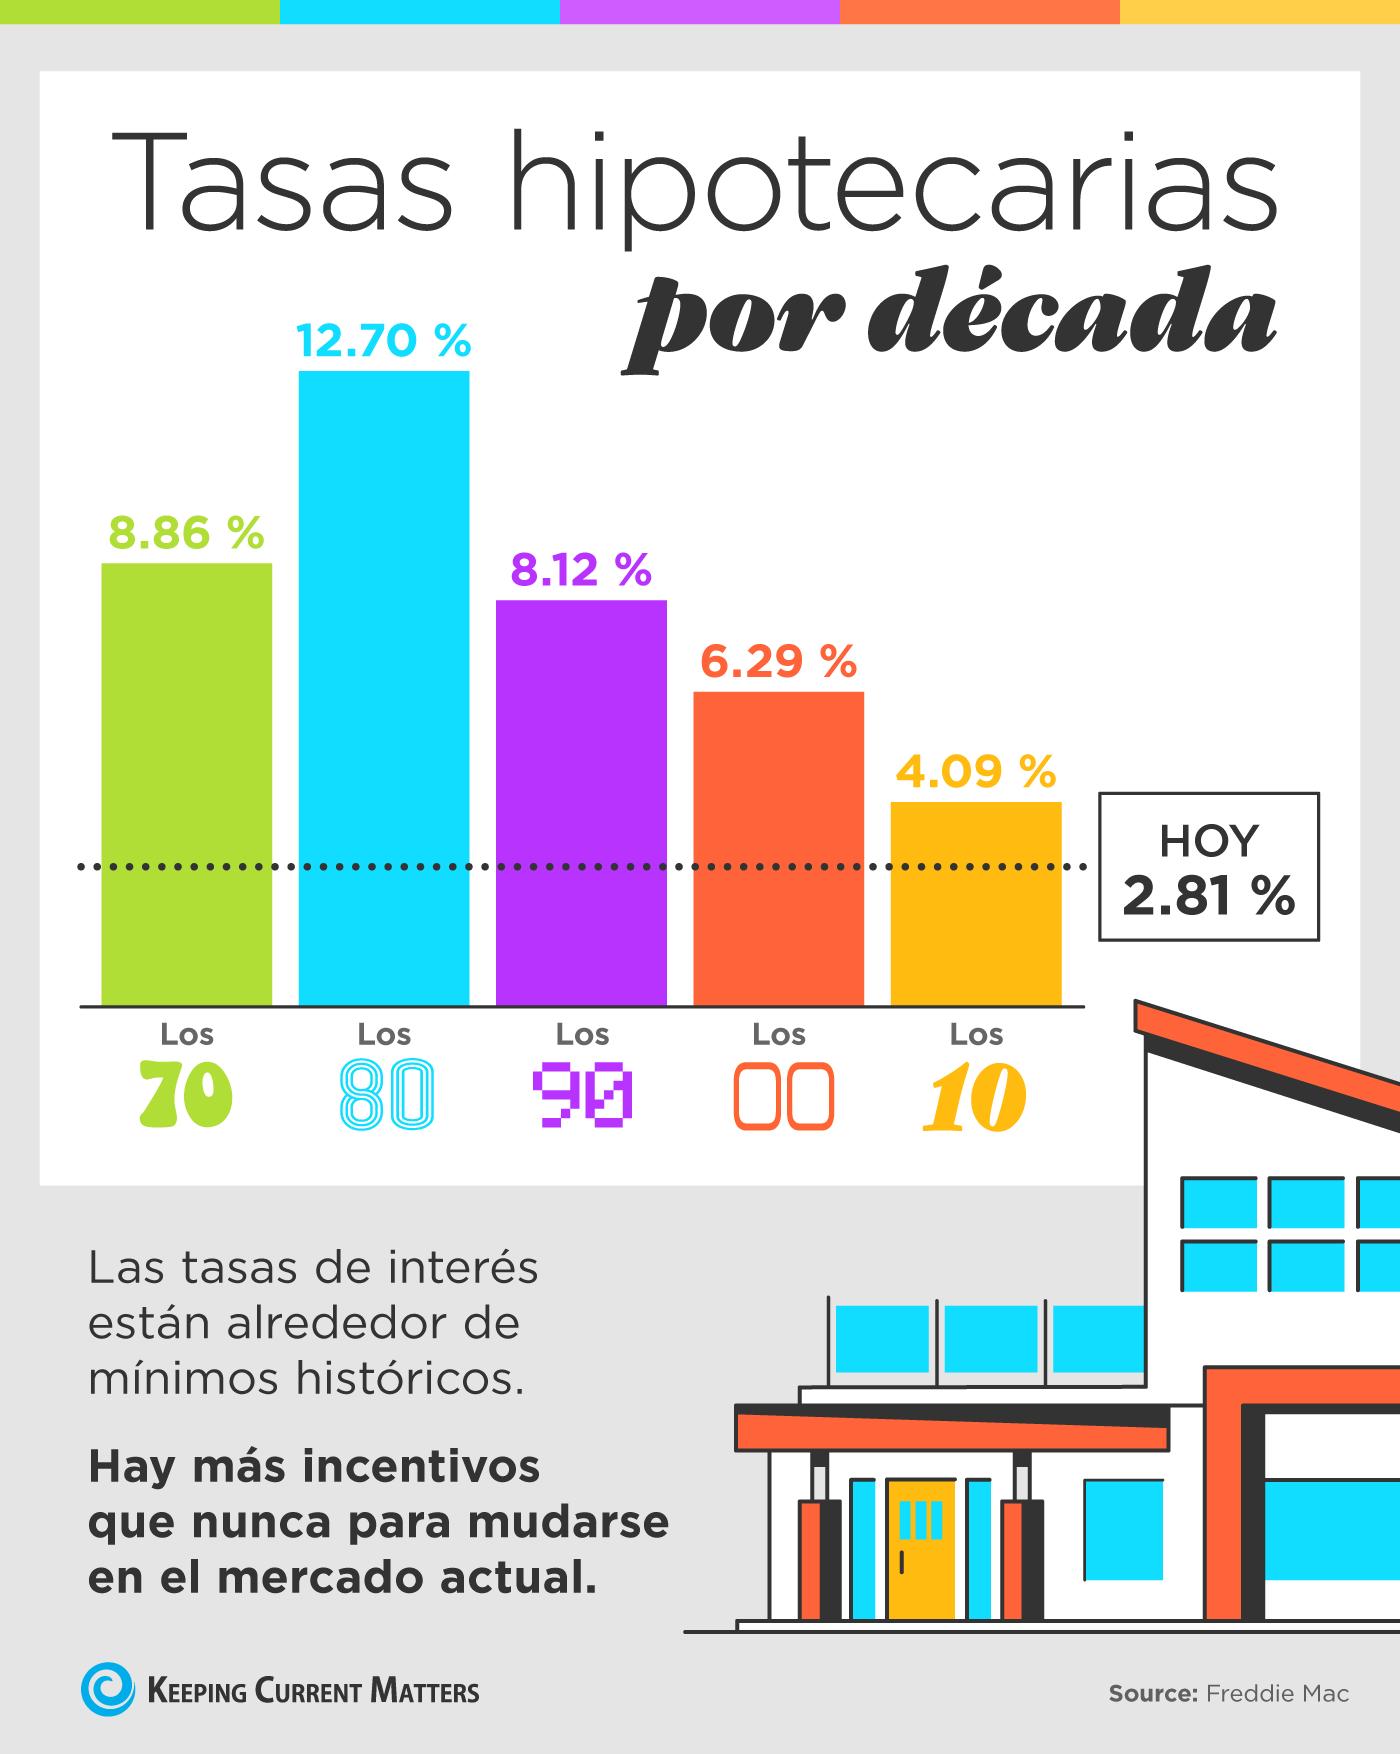 Tasas hipotecarias por década [Infografía] | Keeping Current Matters